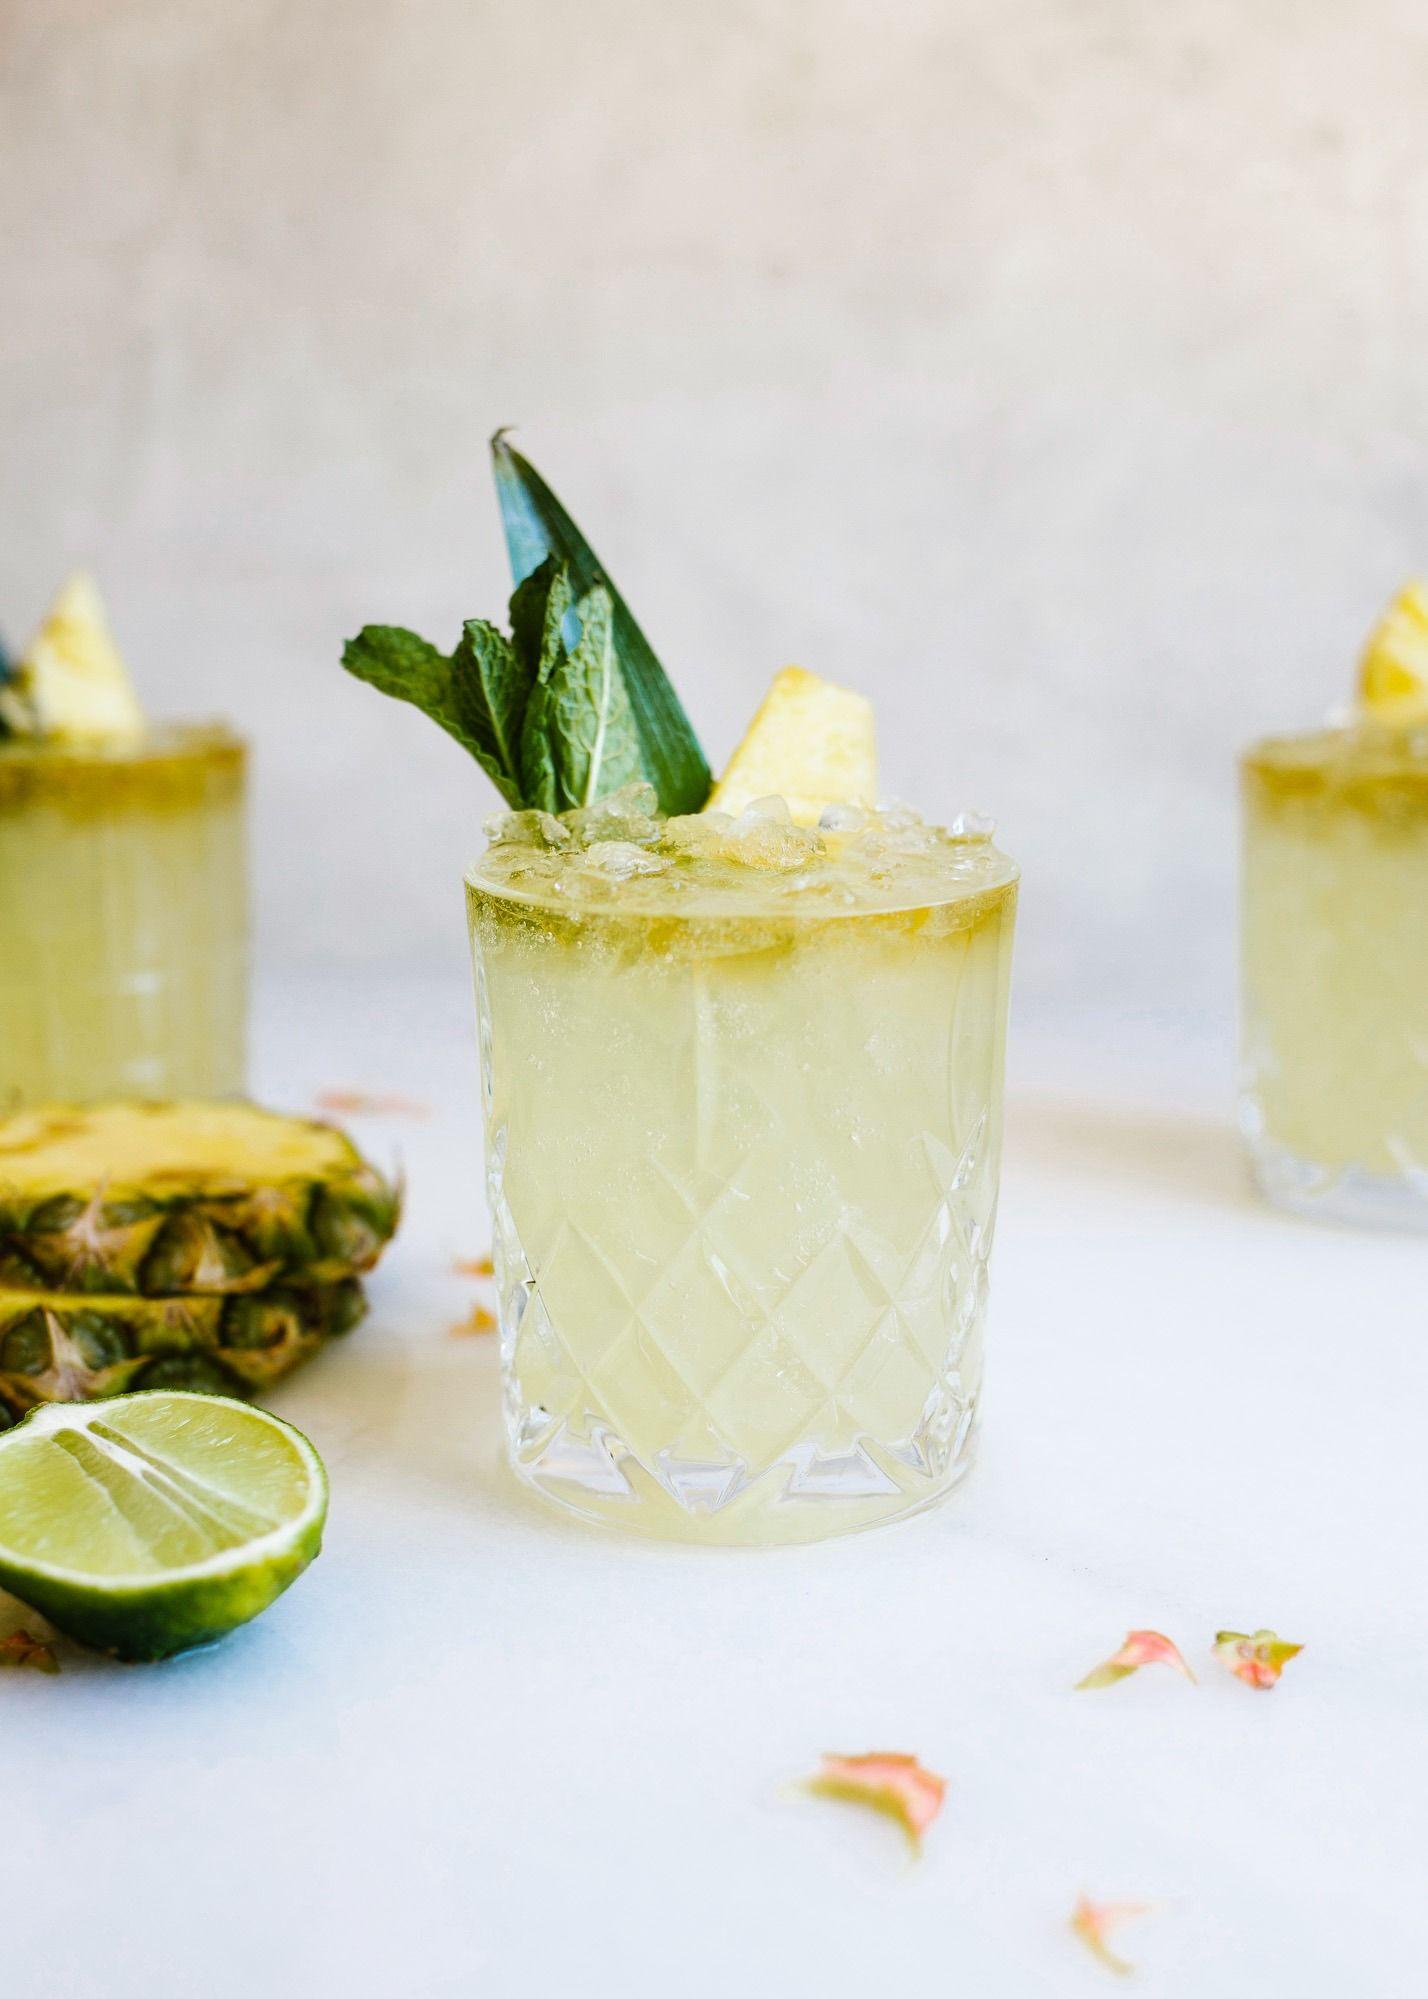 Mai Tai Margaritas Wood Spoon Recipe Margarita Recipes Flavored Margaritas Fruit Cocktails